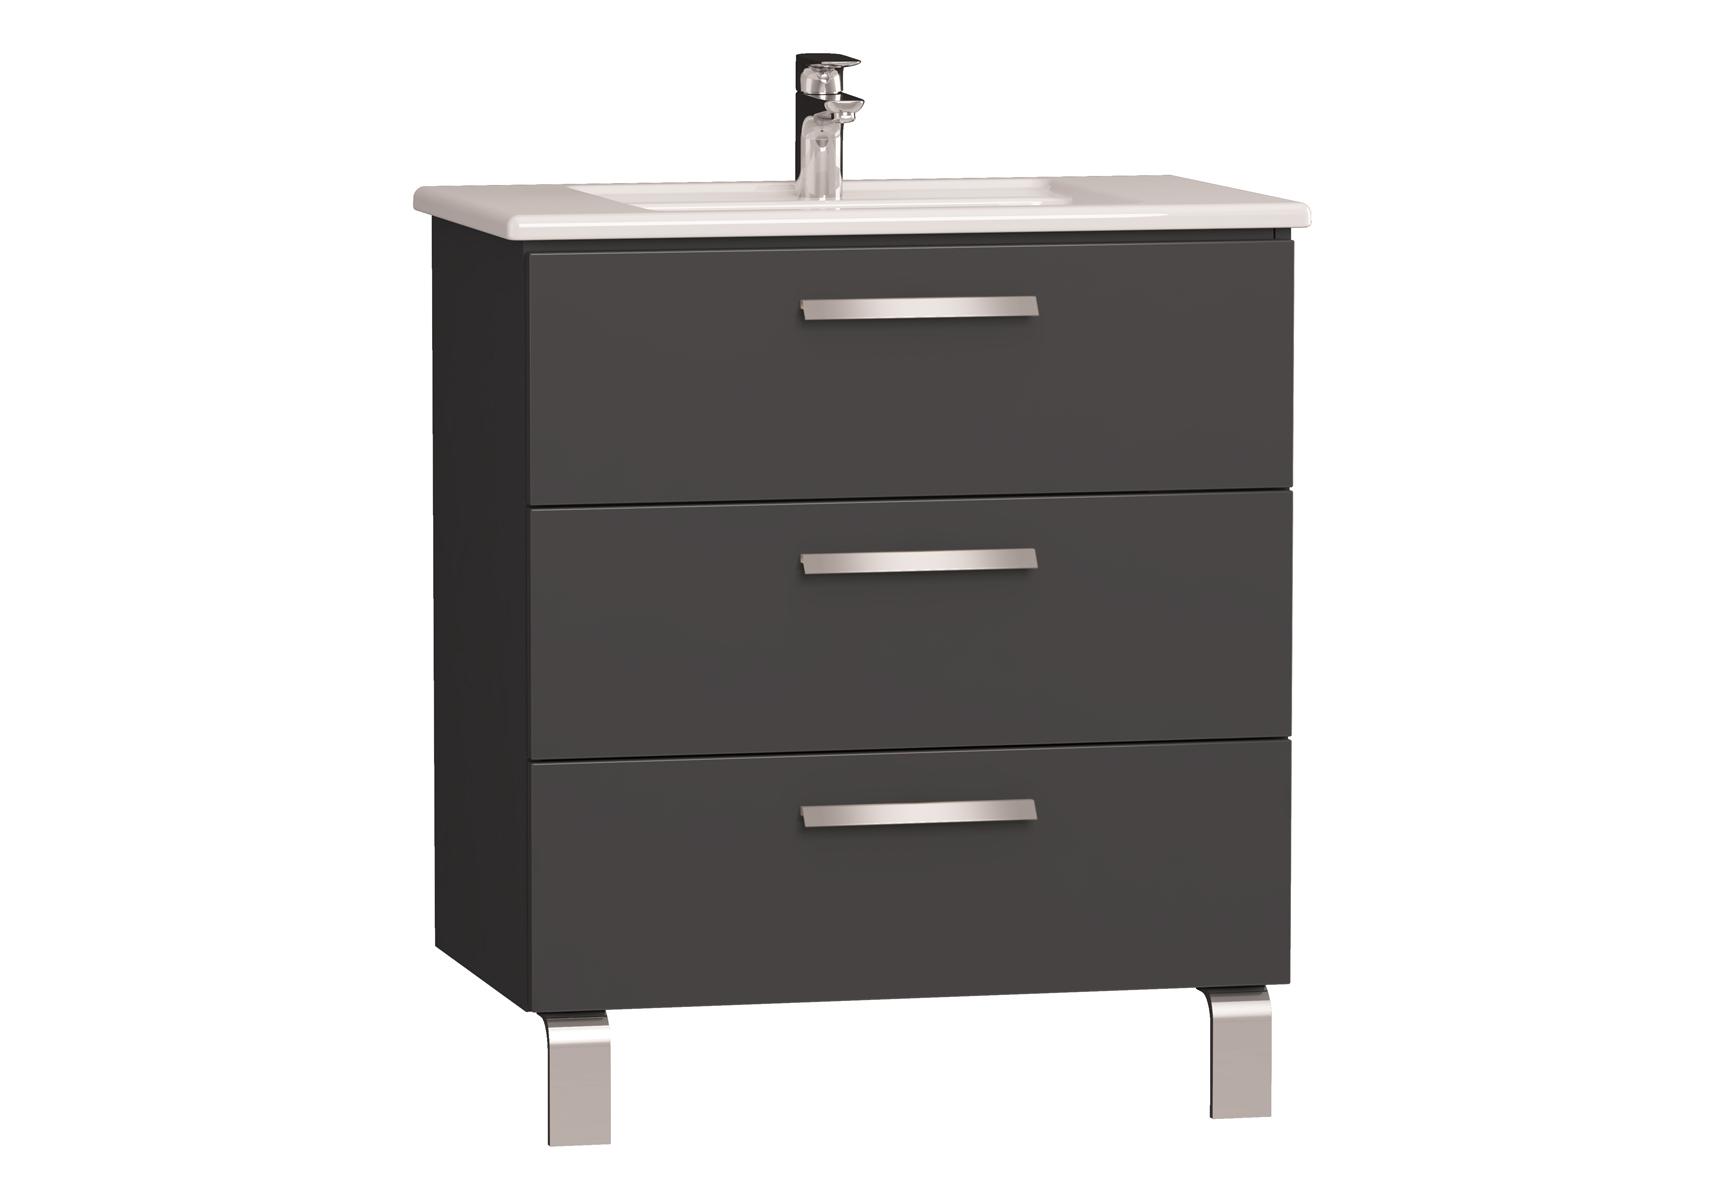 Integra meuble avec plan céramique avec trois tiroirs, 80 cm, anthraciteacite haute brillance